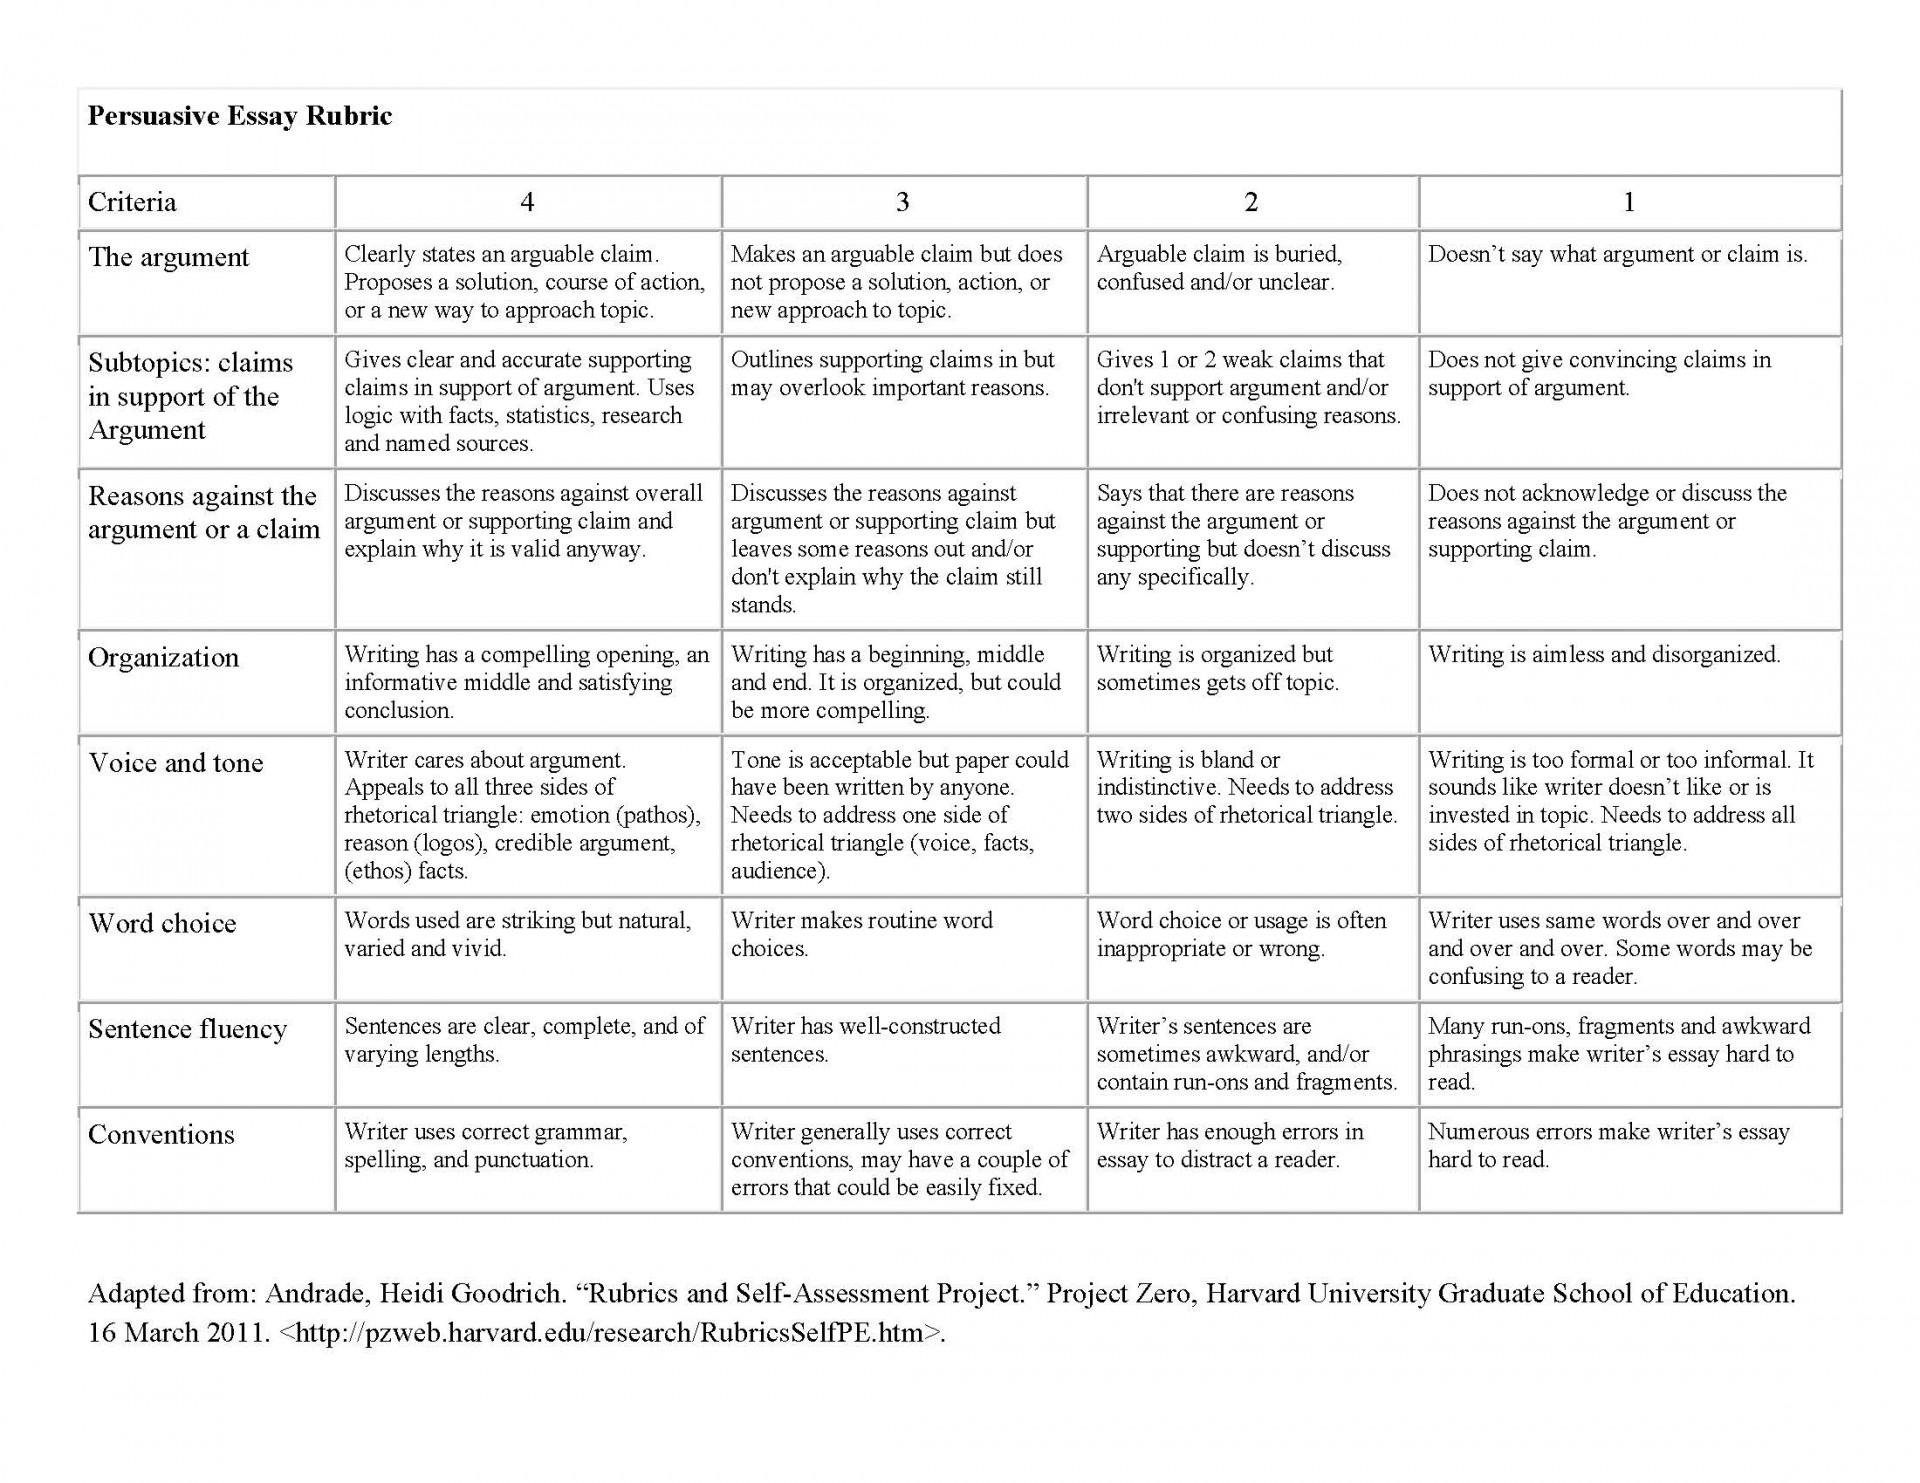 019 Good Persuasive Essay Topics Handout Rubriccb Amazing For College Argumentative High School 1920